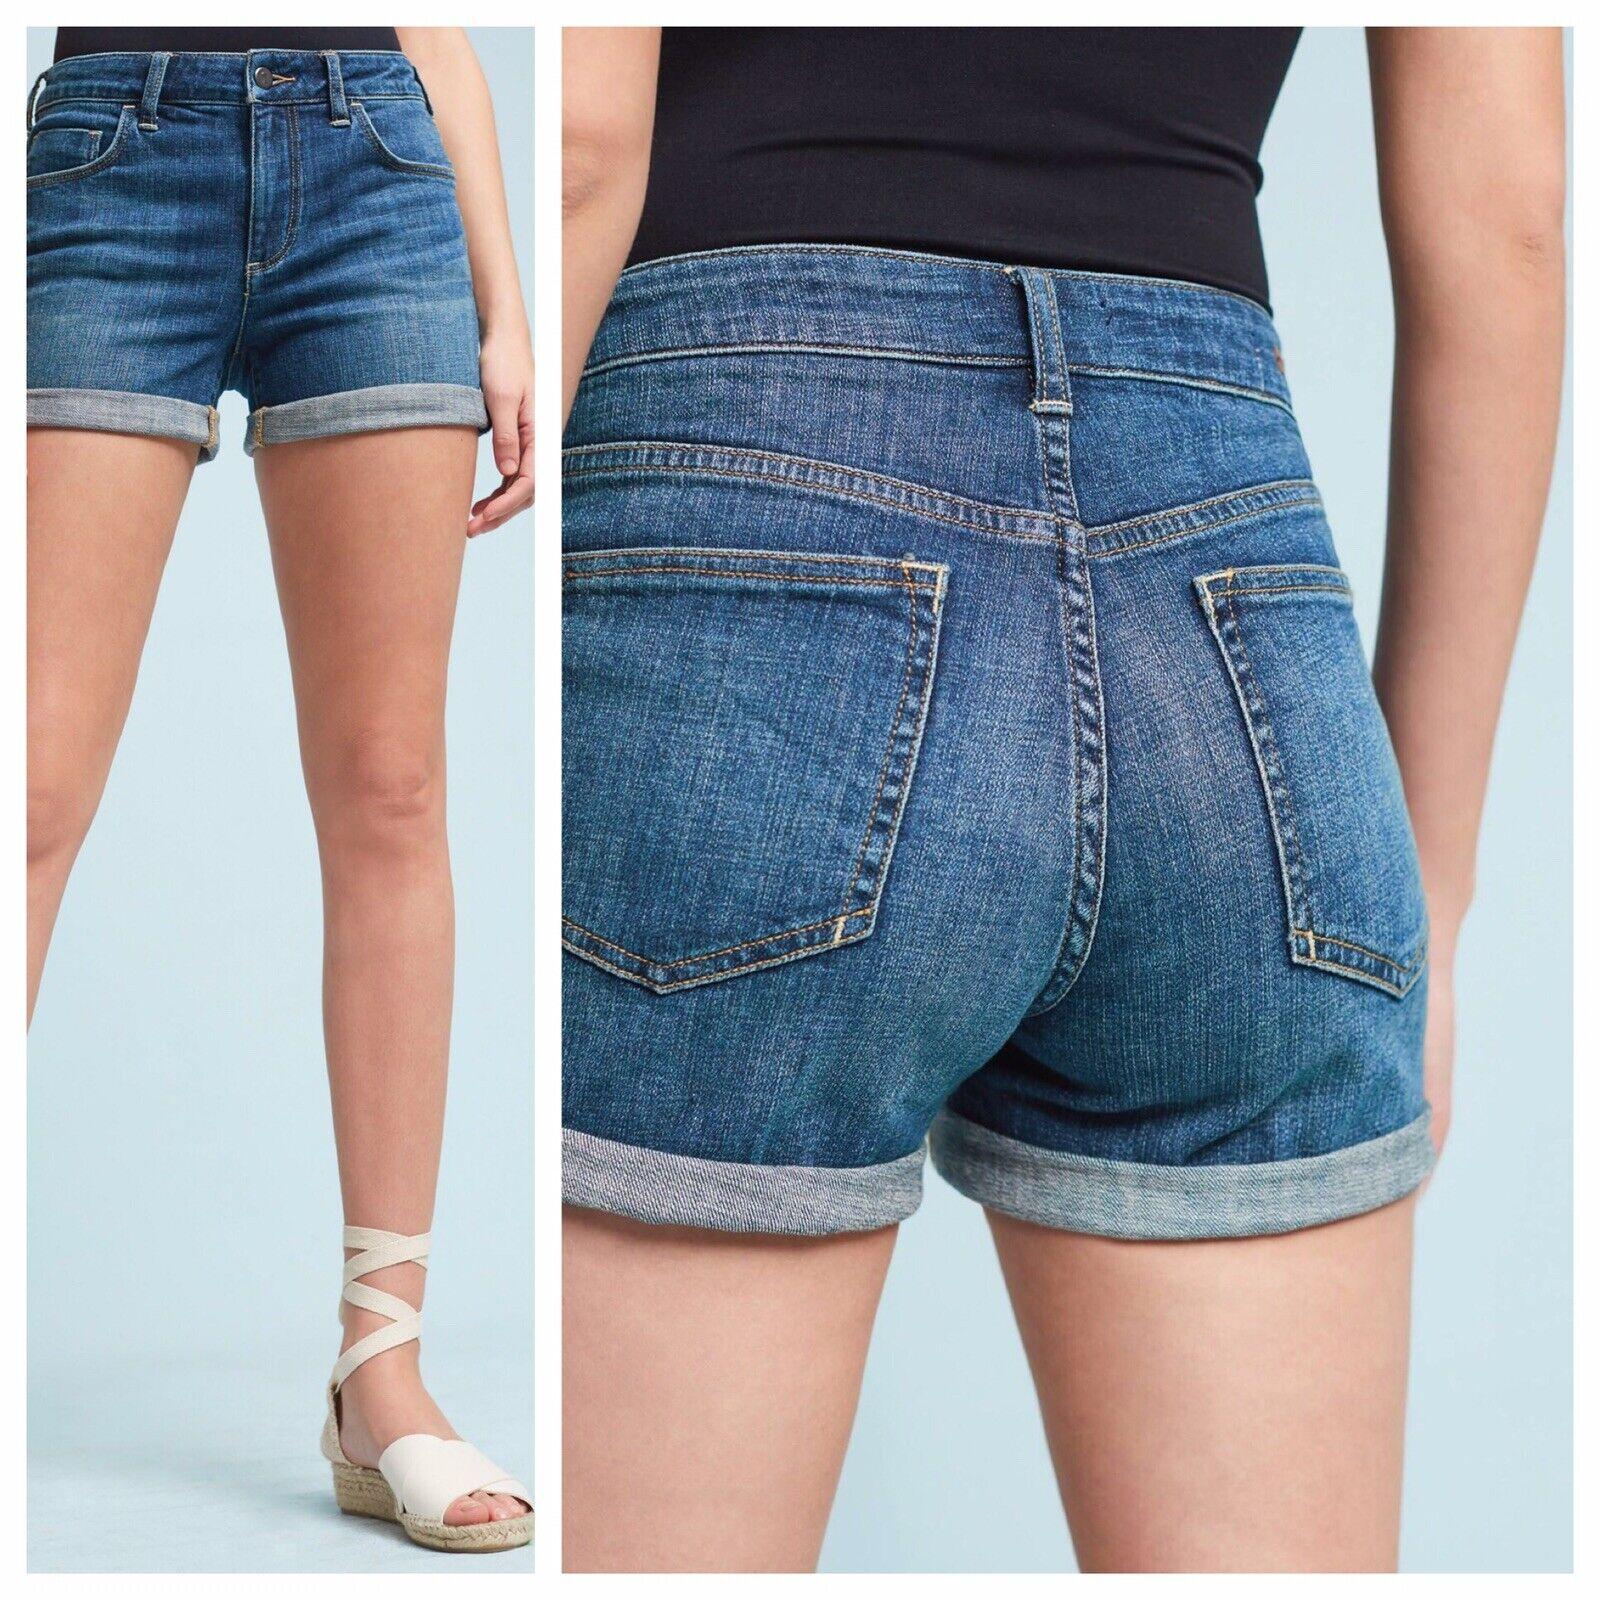 NWT Pilcro Jeans - Denim Script Roll Up Shorts Size 28